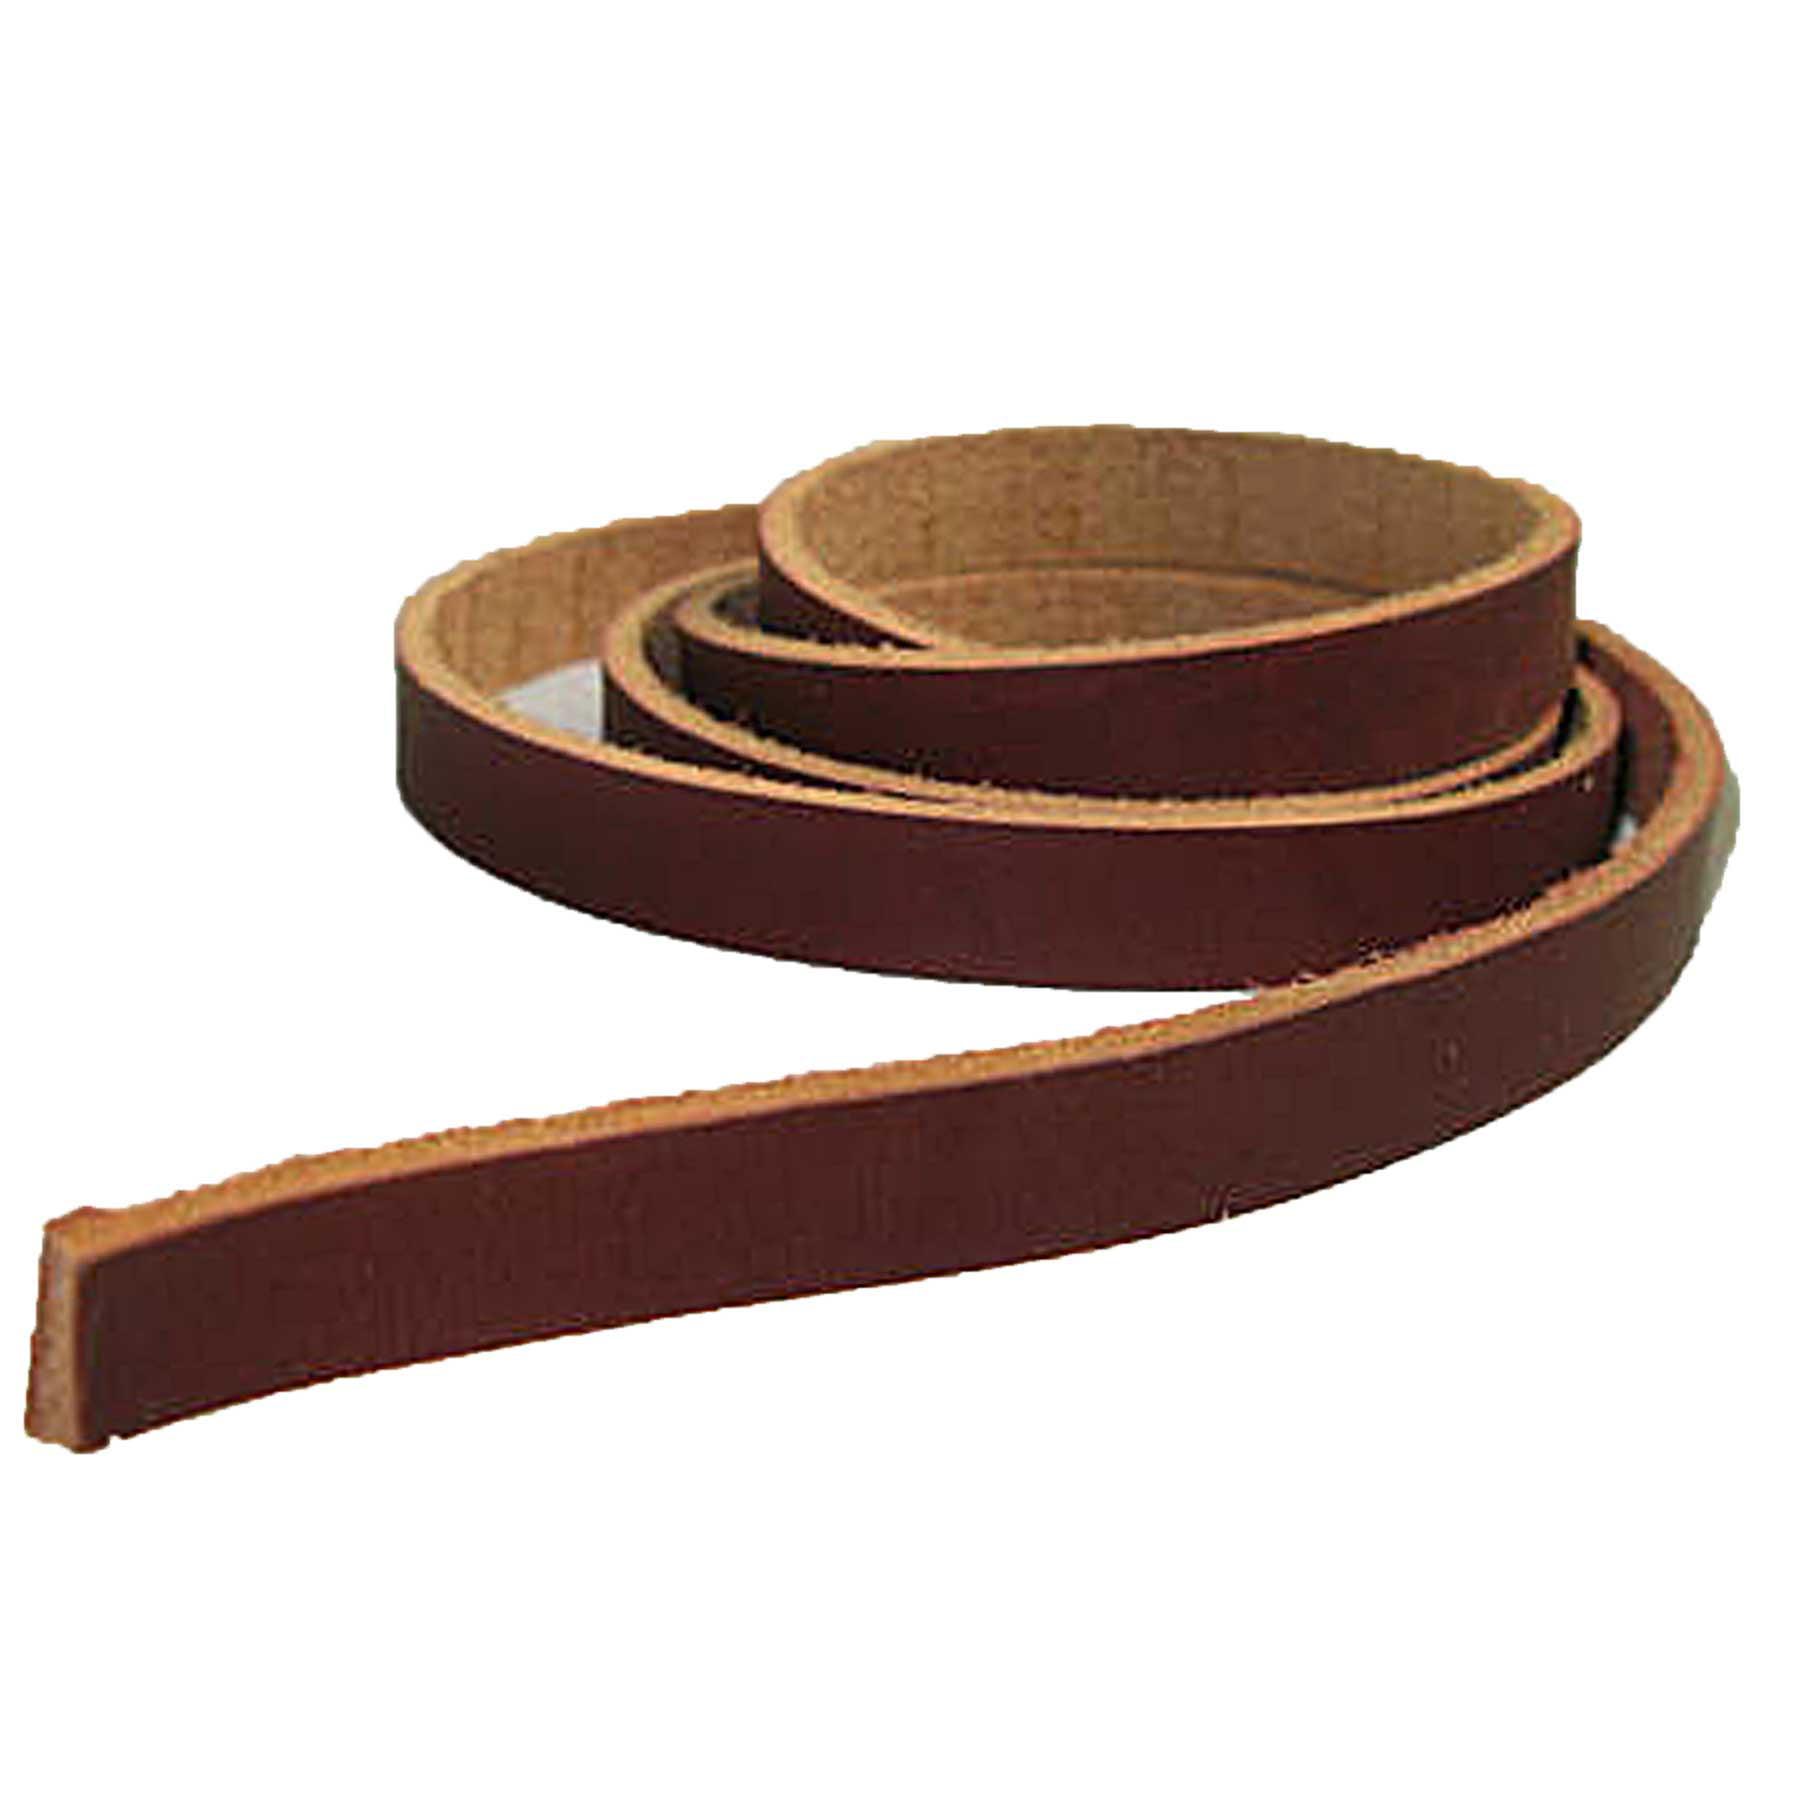 "Latigo Saddle String Leather Strap 1/2"" x 48"" 5008-13 Black"